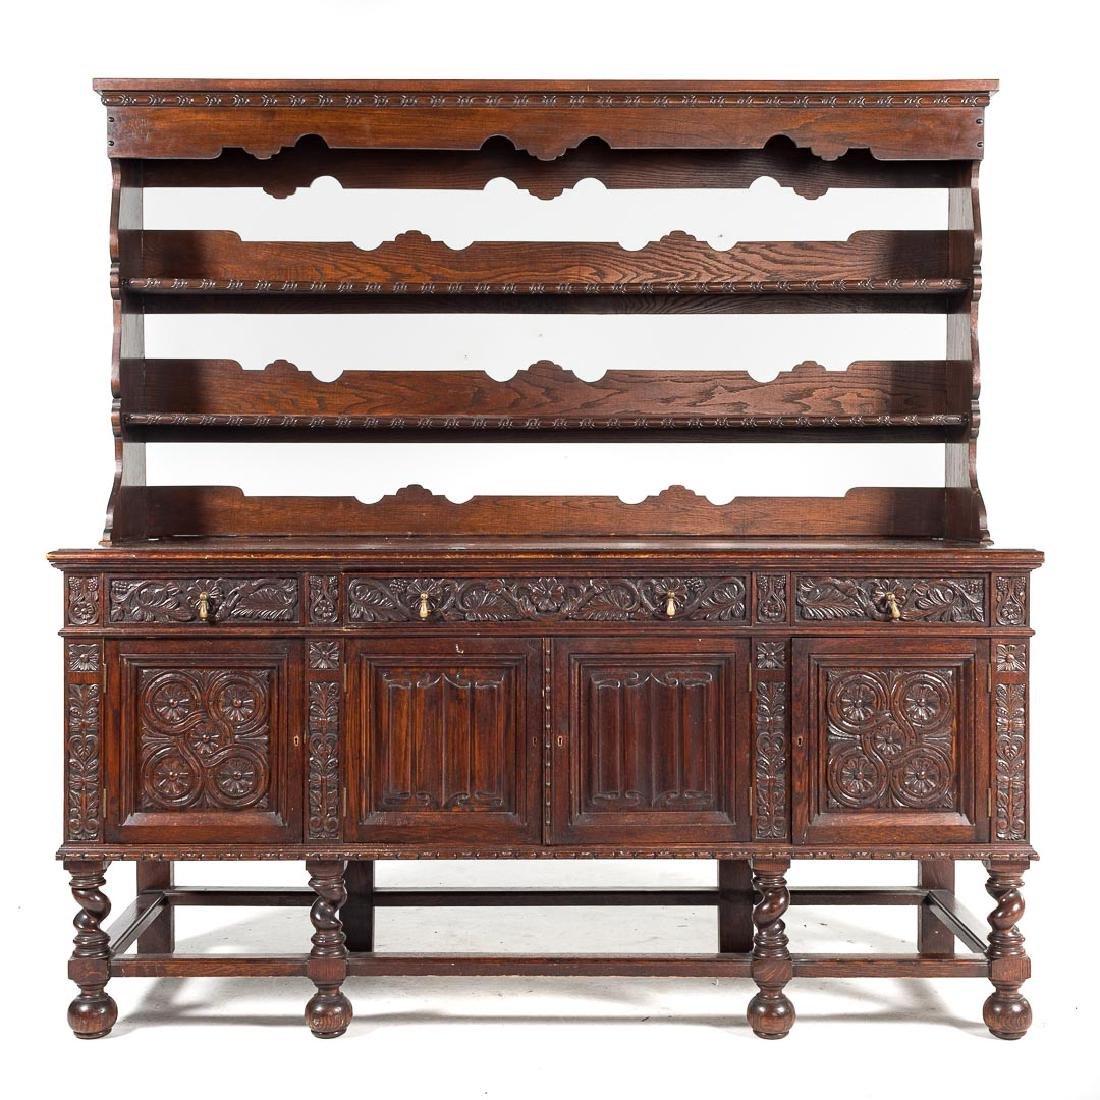 Jacobean Revival style carved oak dresser,